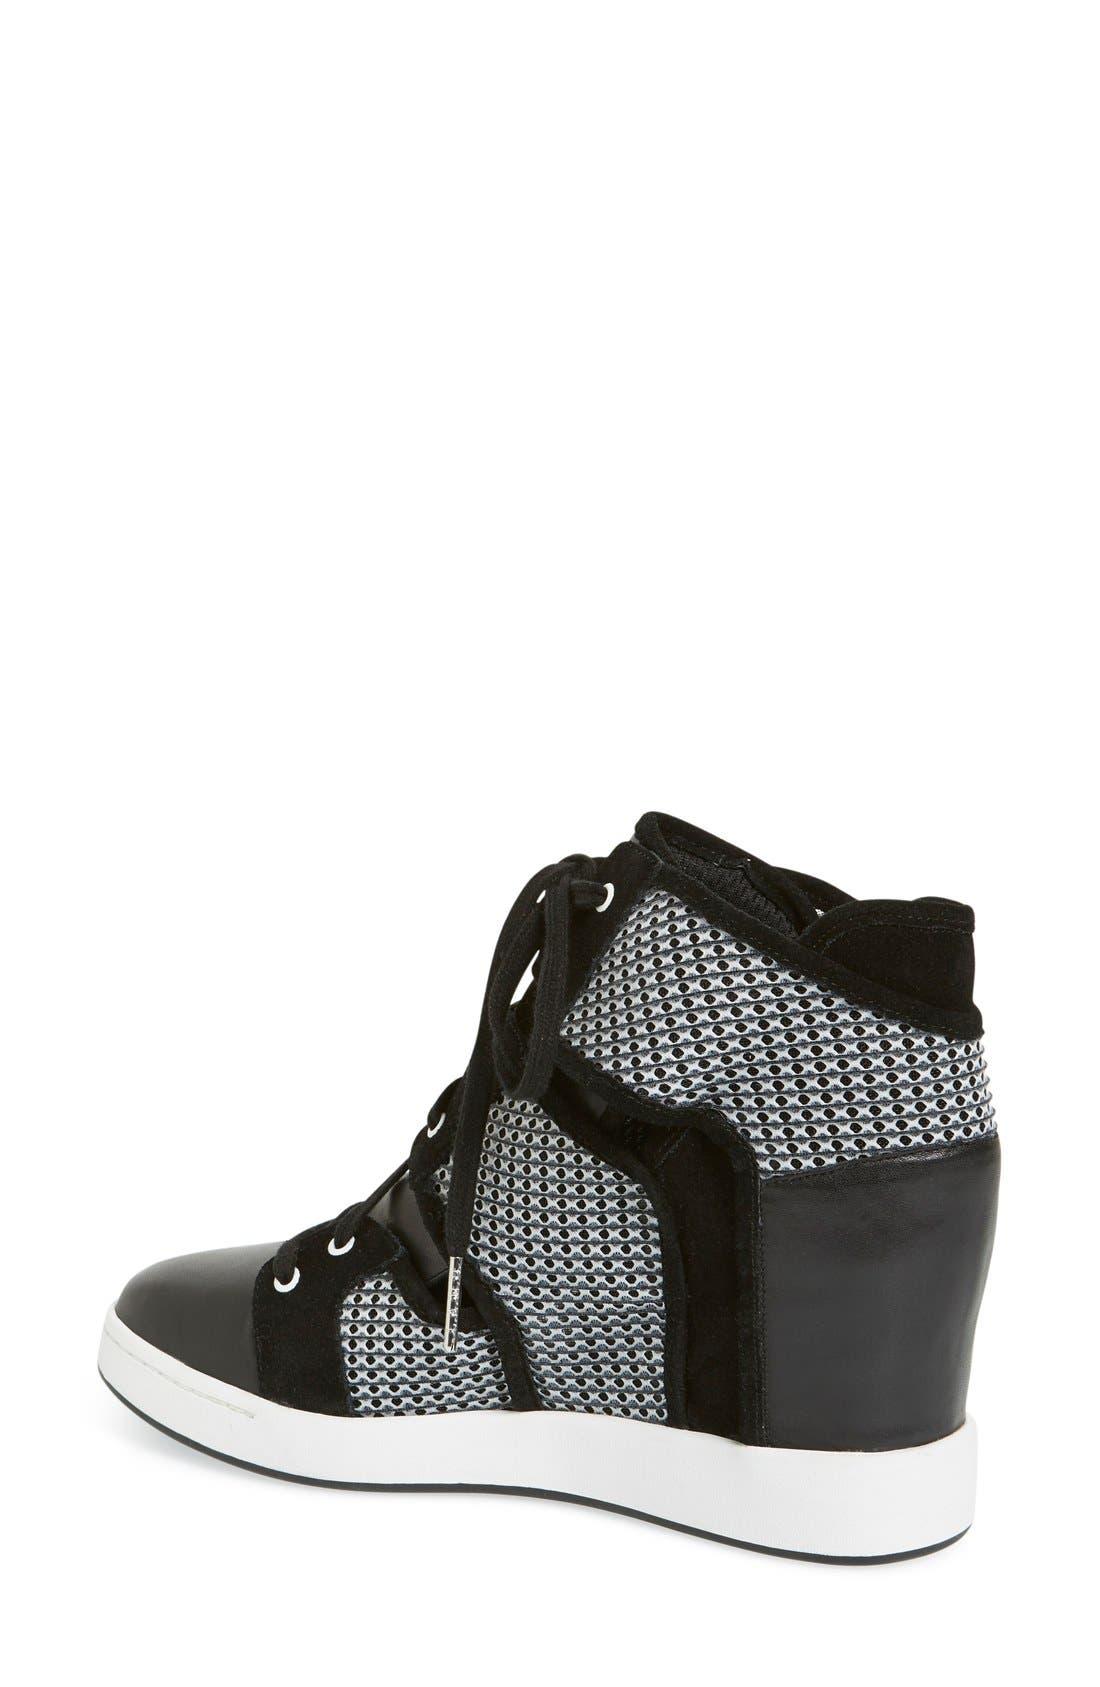 Alternate Image 2  - L.A.M.B. 'Gera' Hidden Wedge Sneaker (Women)